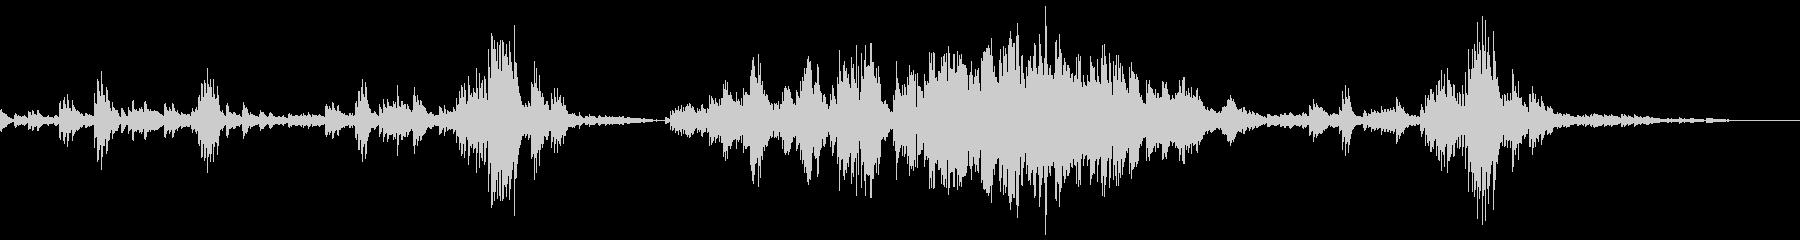 Chopin Etude Op10-3の未再生の波形